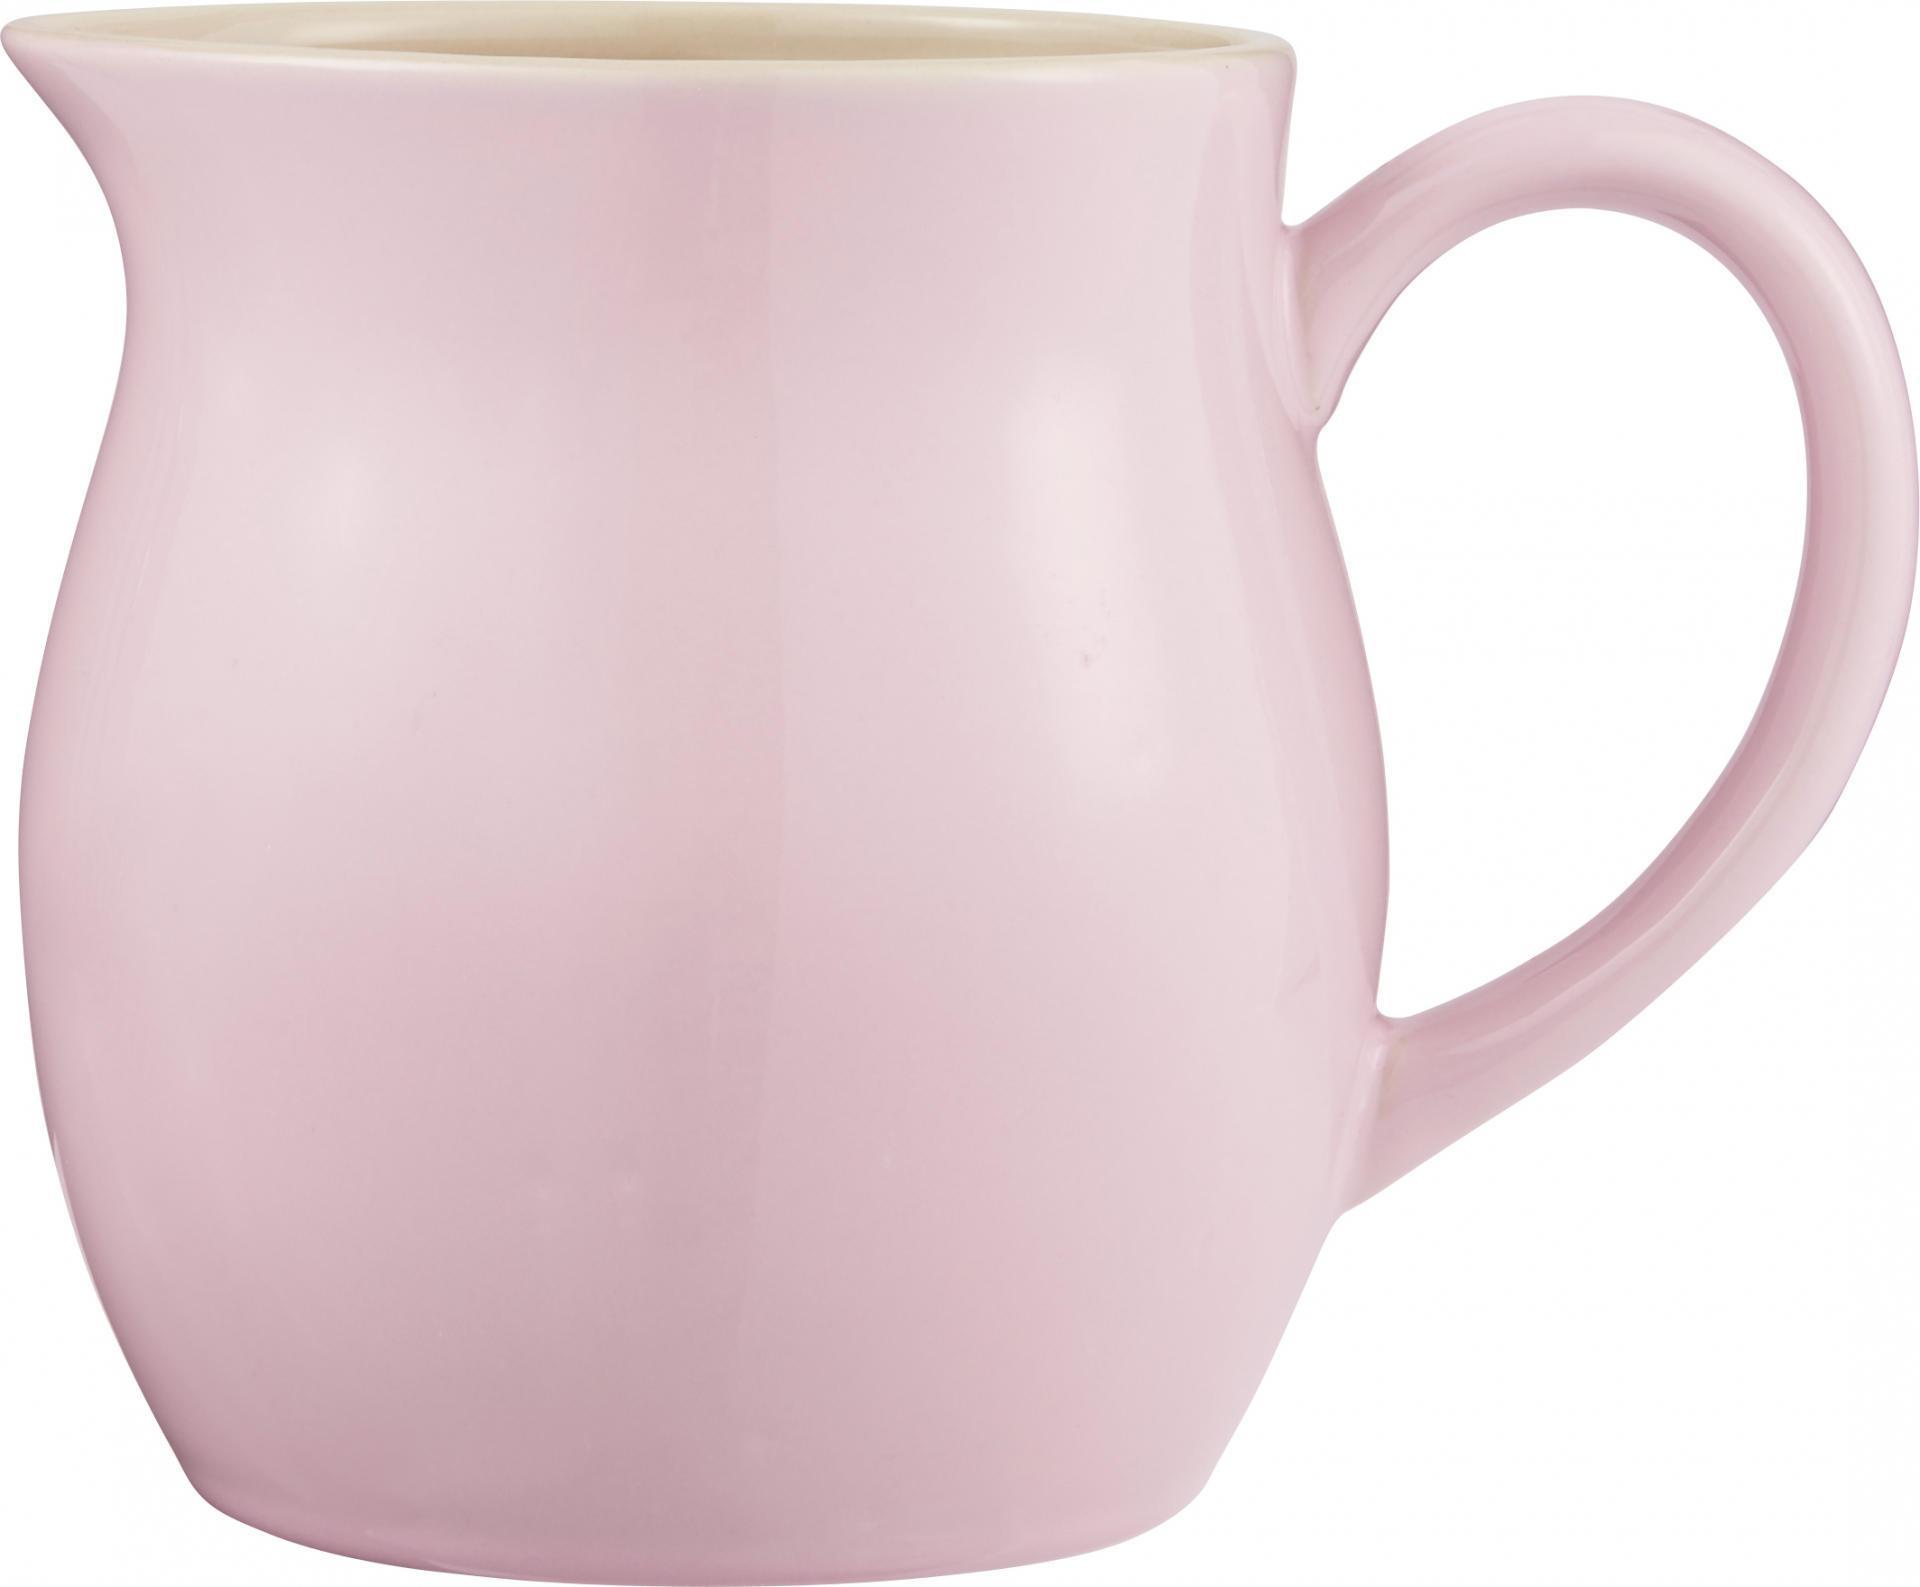 IB LAURSEN Džbán Mynte English Rose 2,5 l, růžová barva, keramika